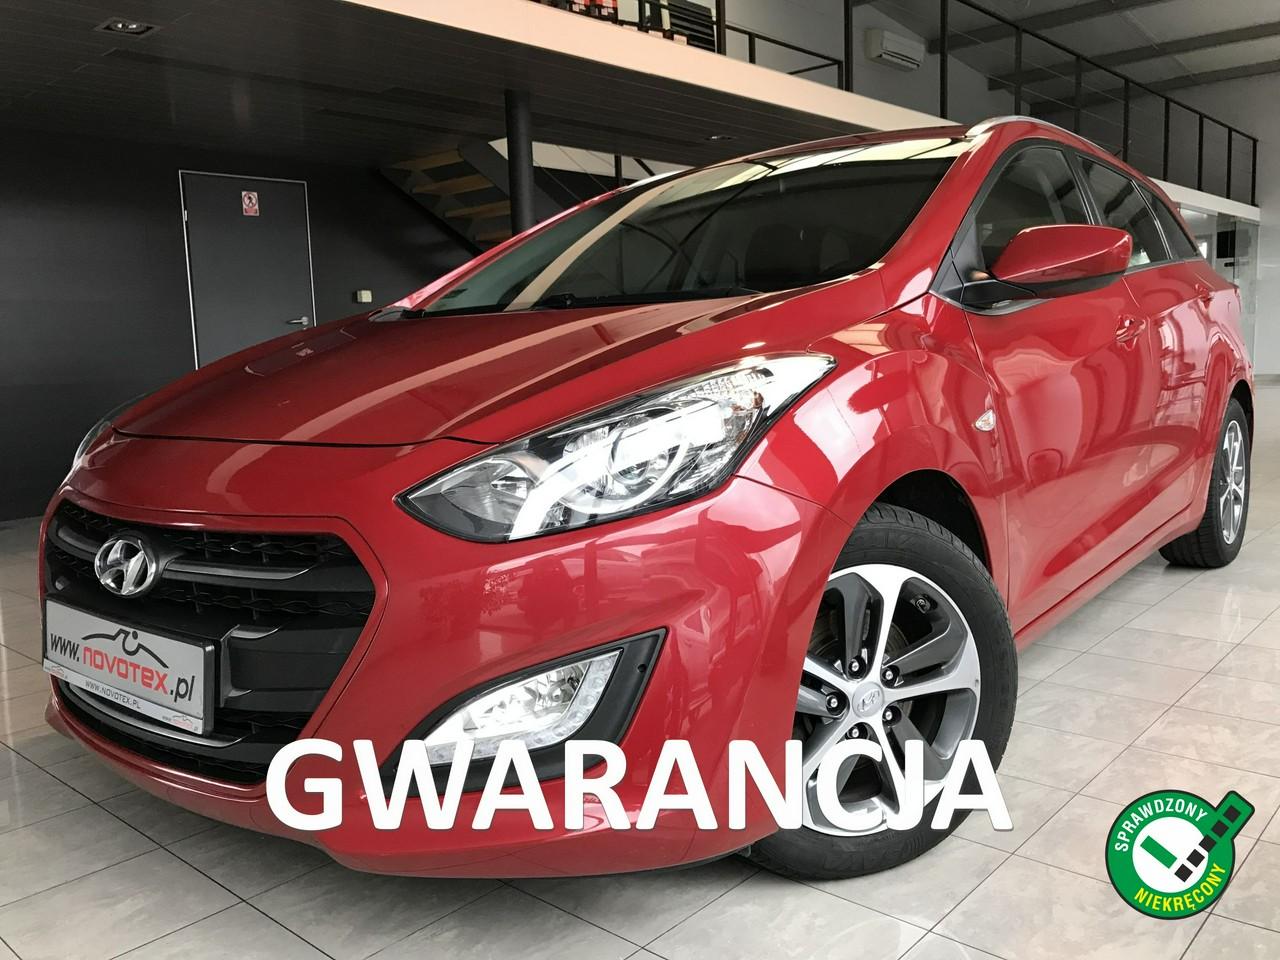 Hyundai i30 1.6crdi*Comfort*1-rej.2017*salon Polska*serwis w ASO